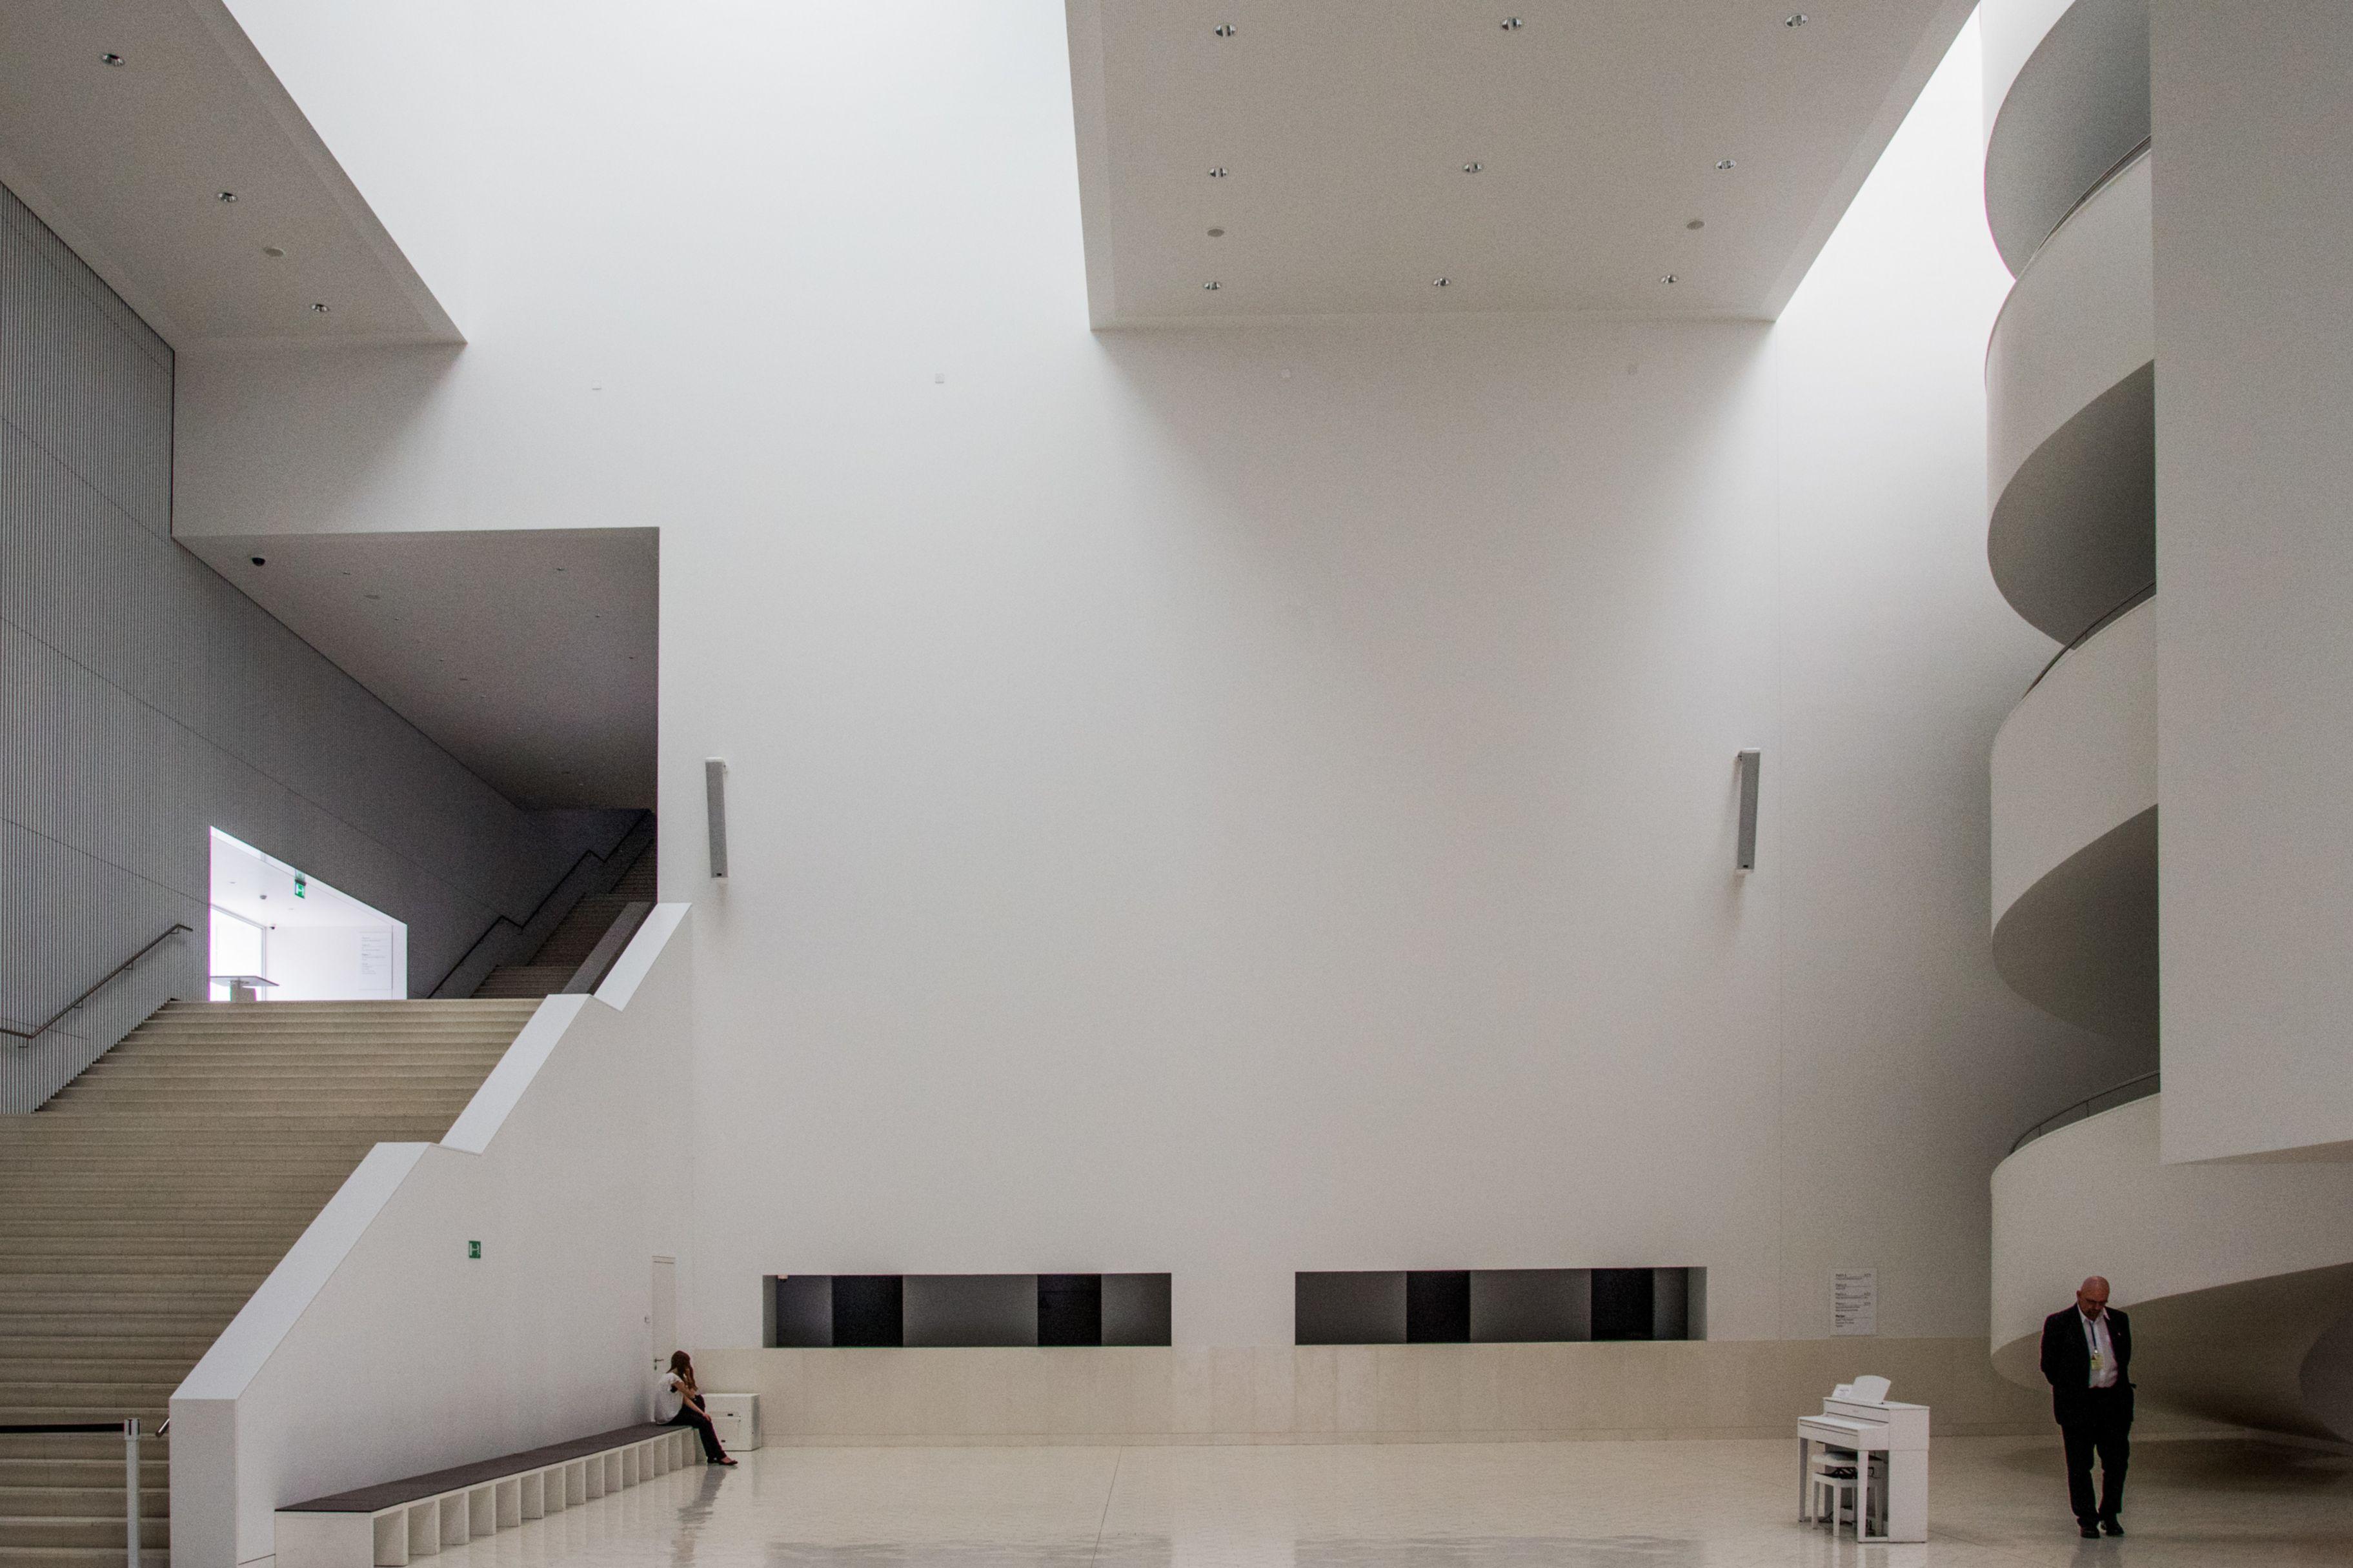 White interior of Szczecin Philharmonic Hall in Poland